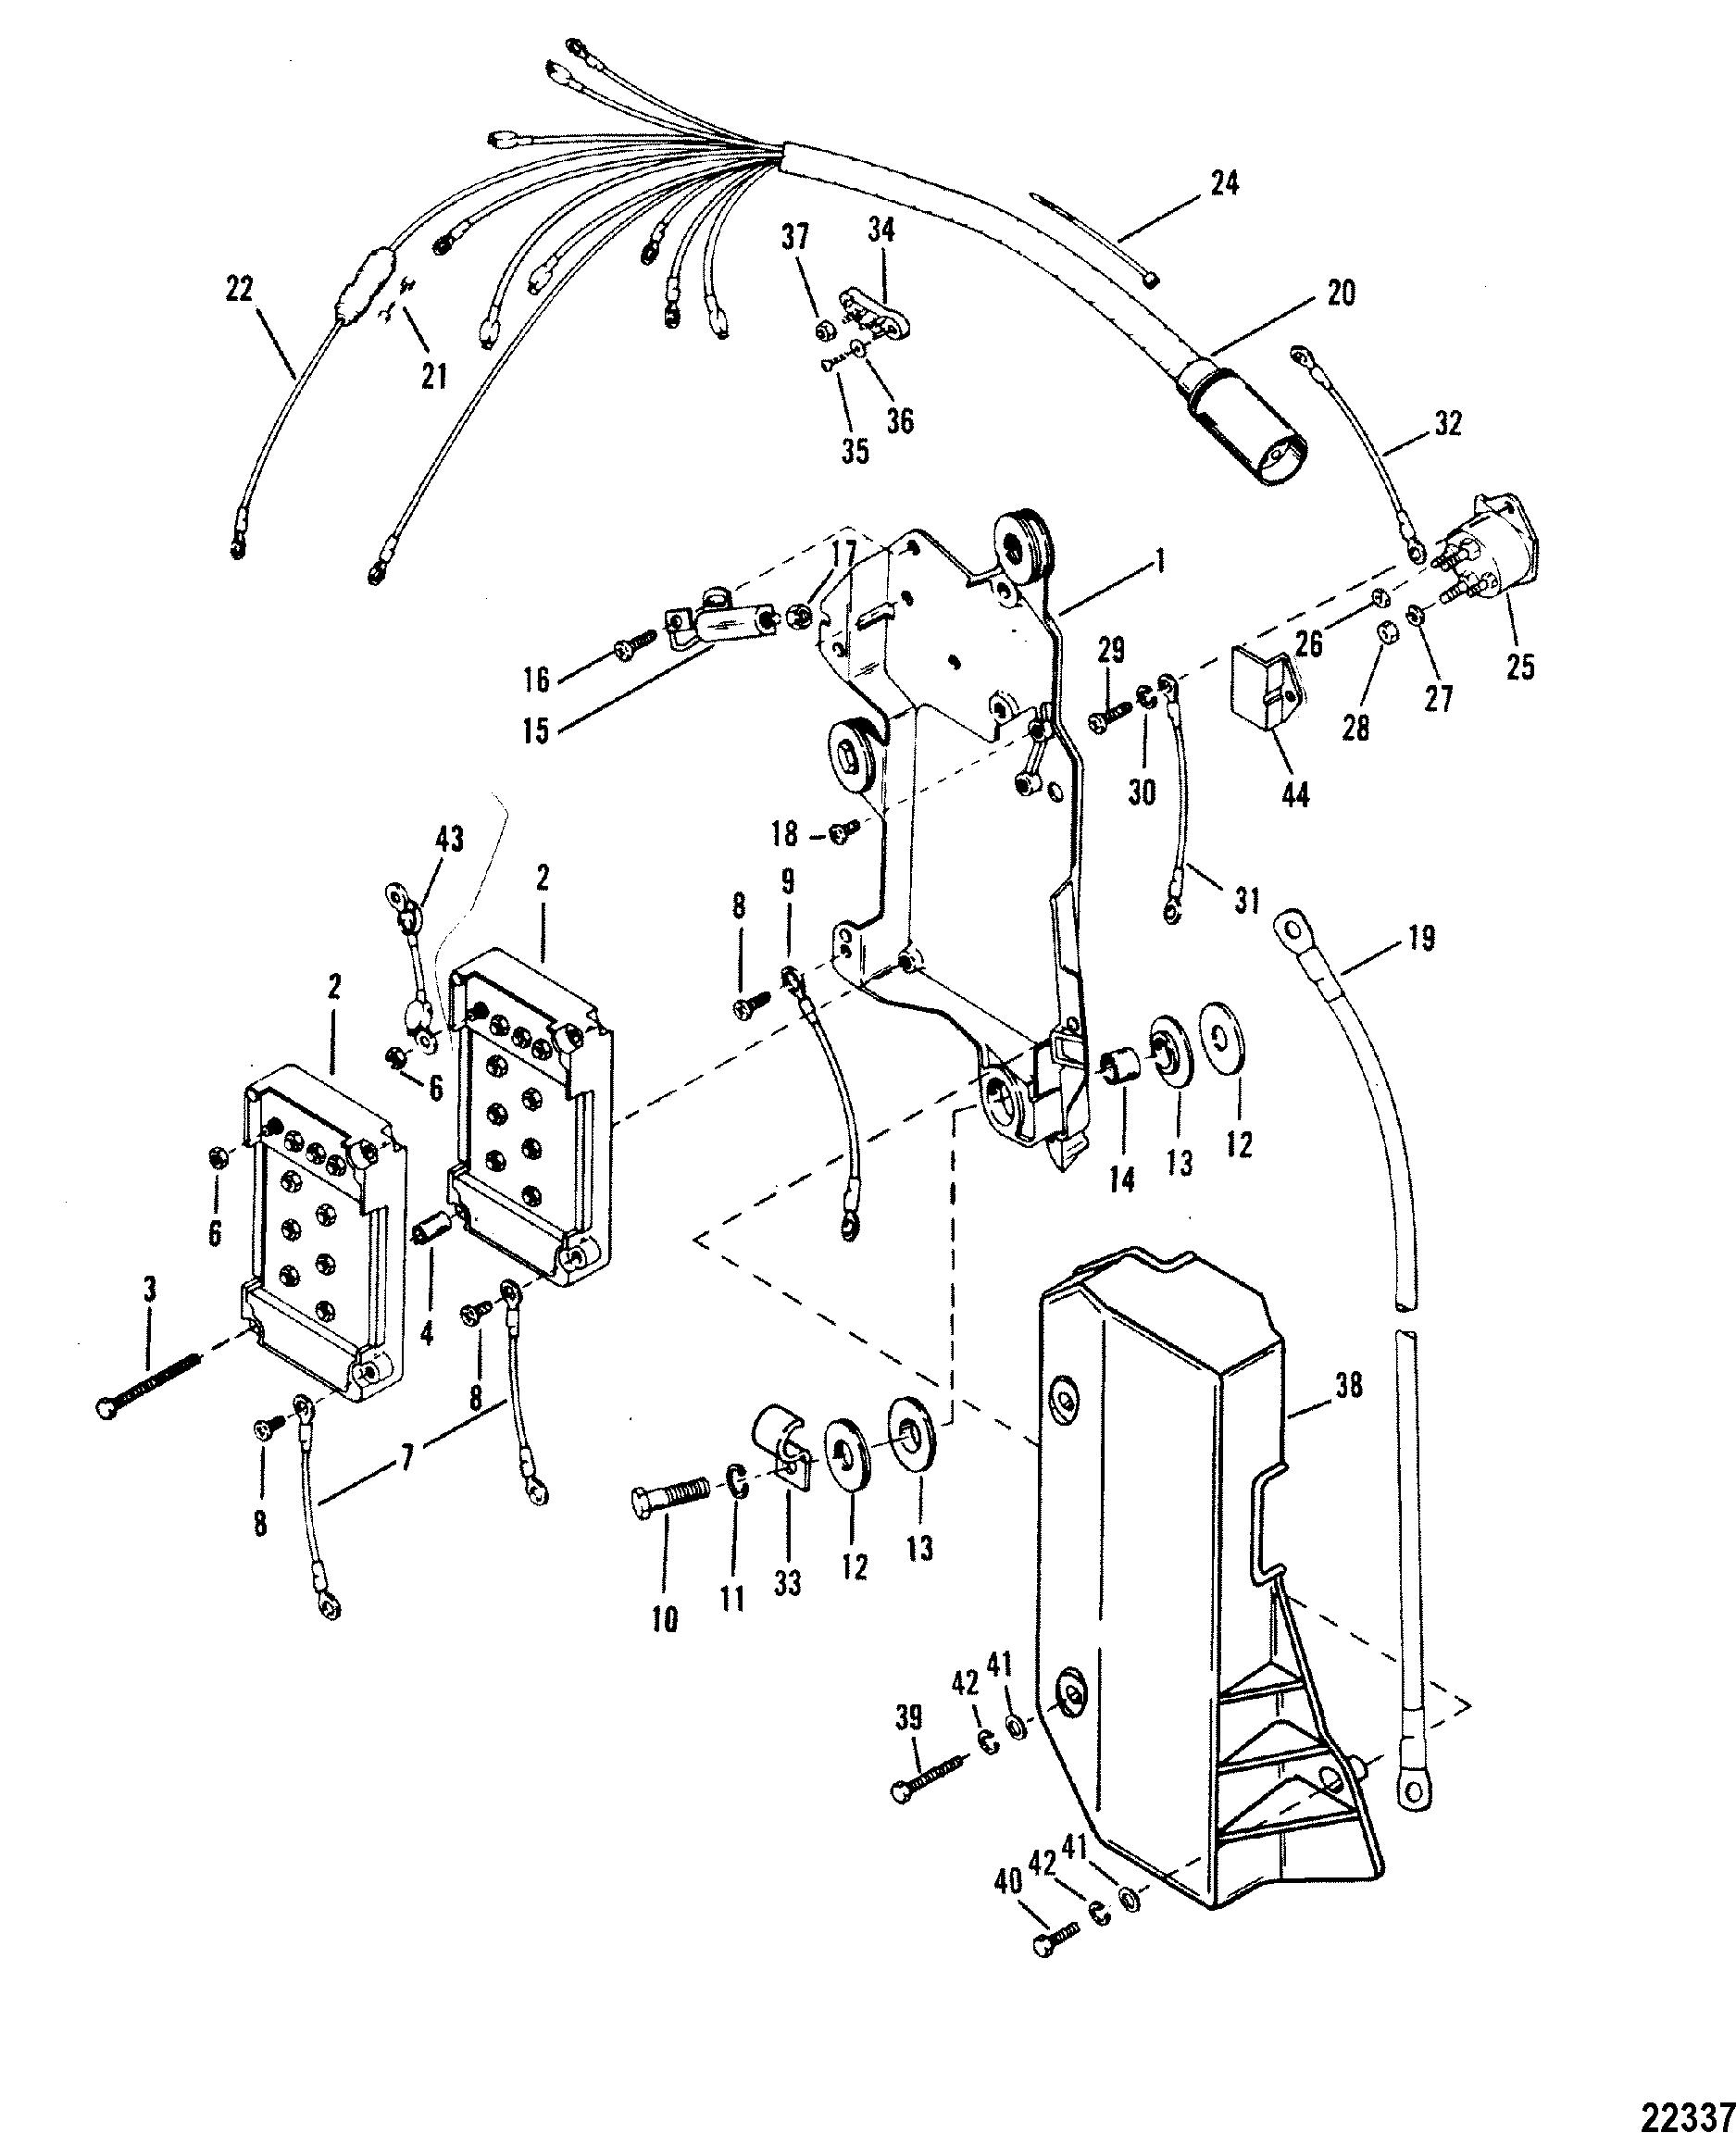 Wiring harness starter solenoid for mariner mercury 175 xri 175